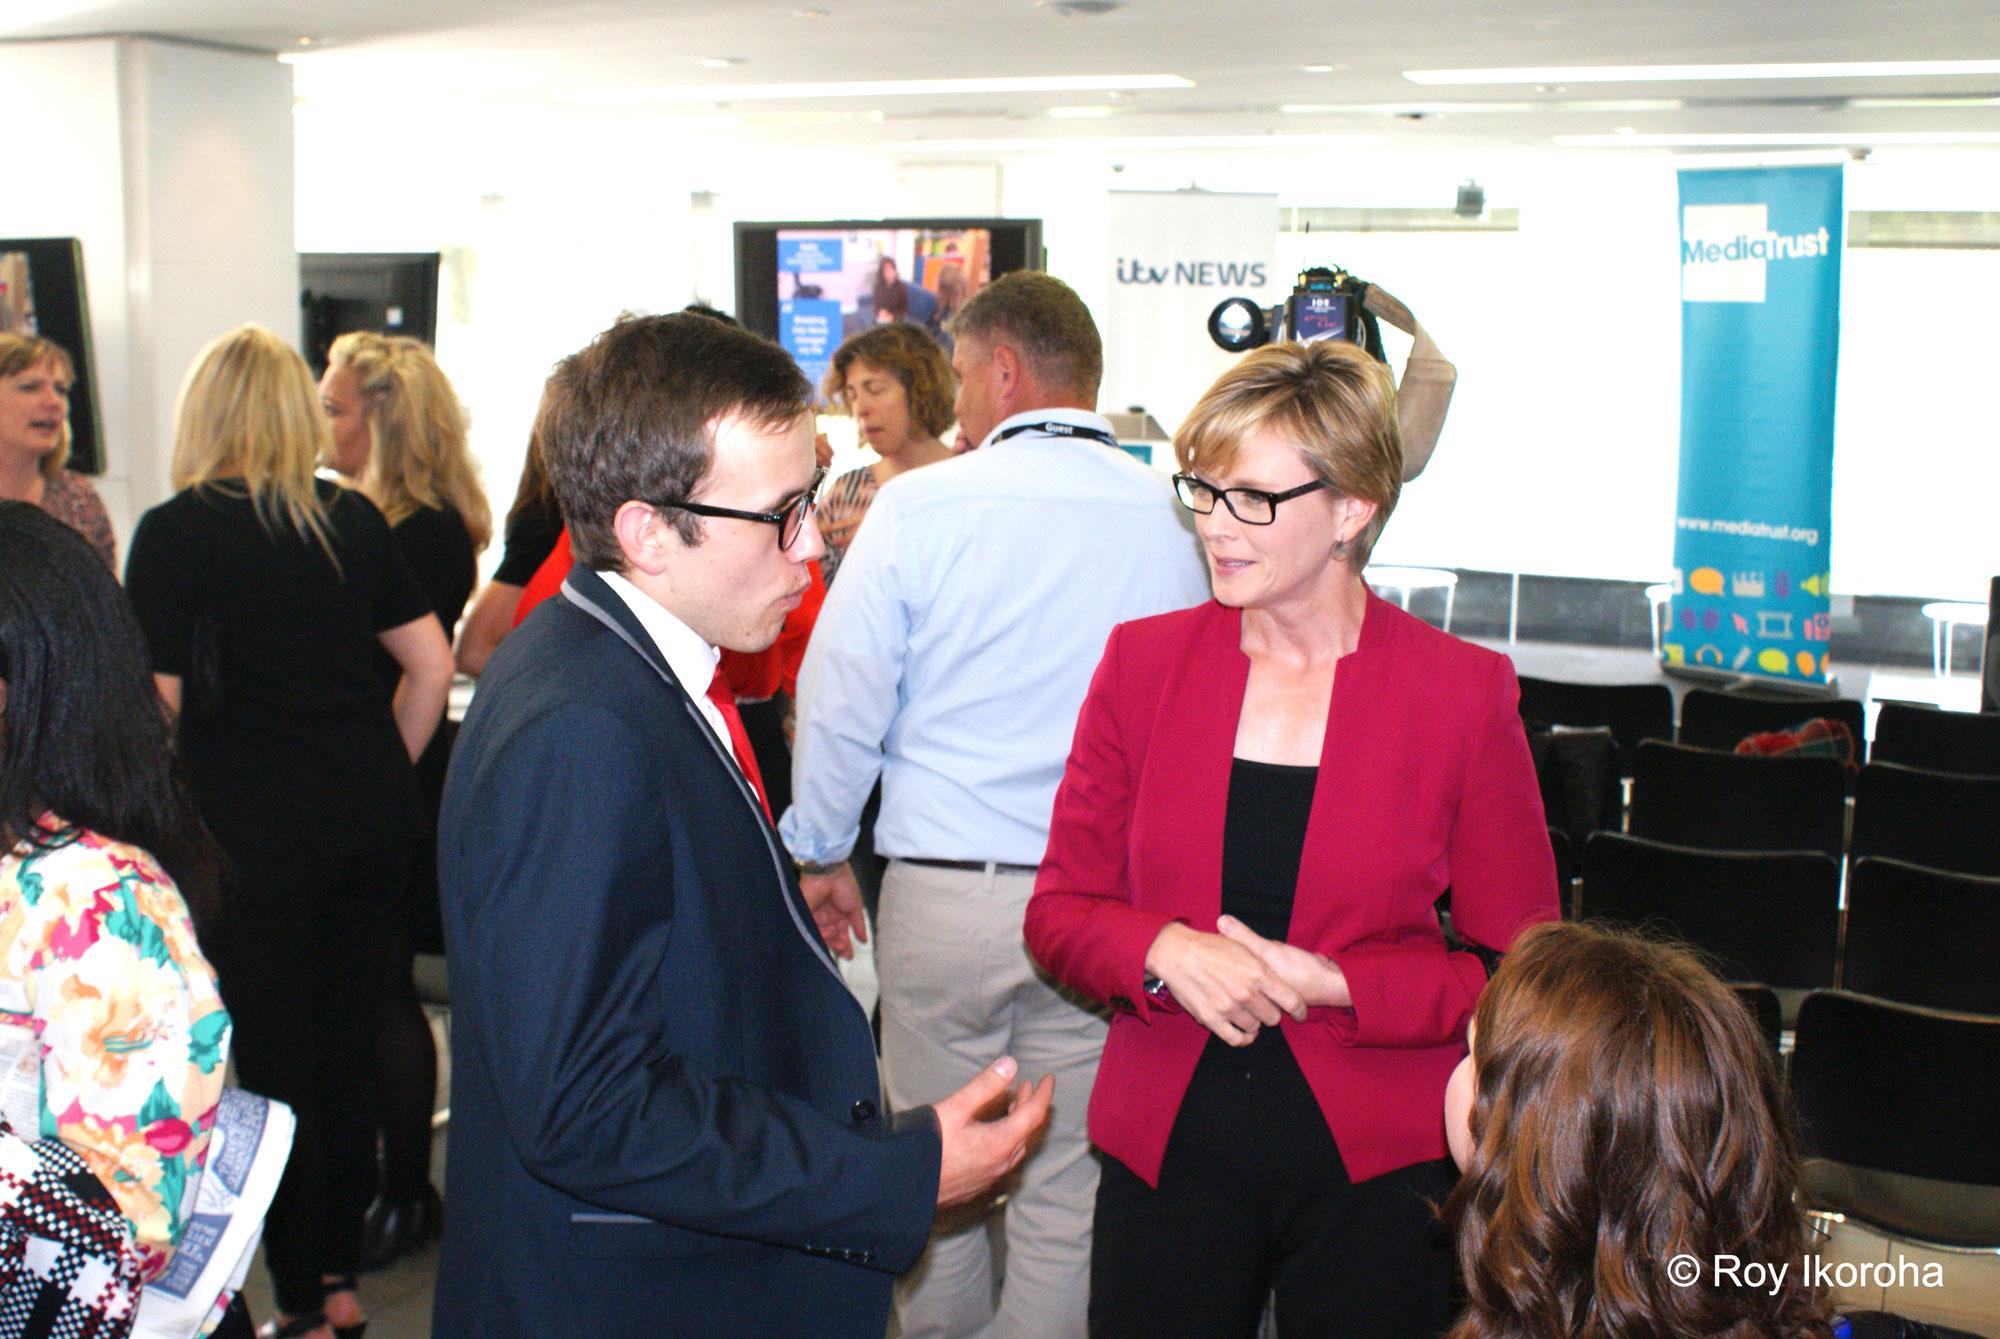 Julie Etchingham talking with finalist Paul Davies   © Roy Ikoroha